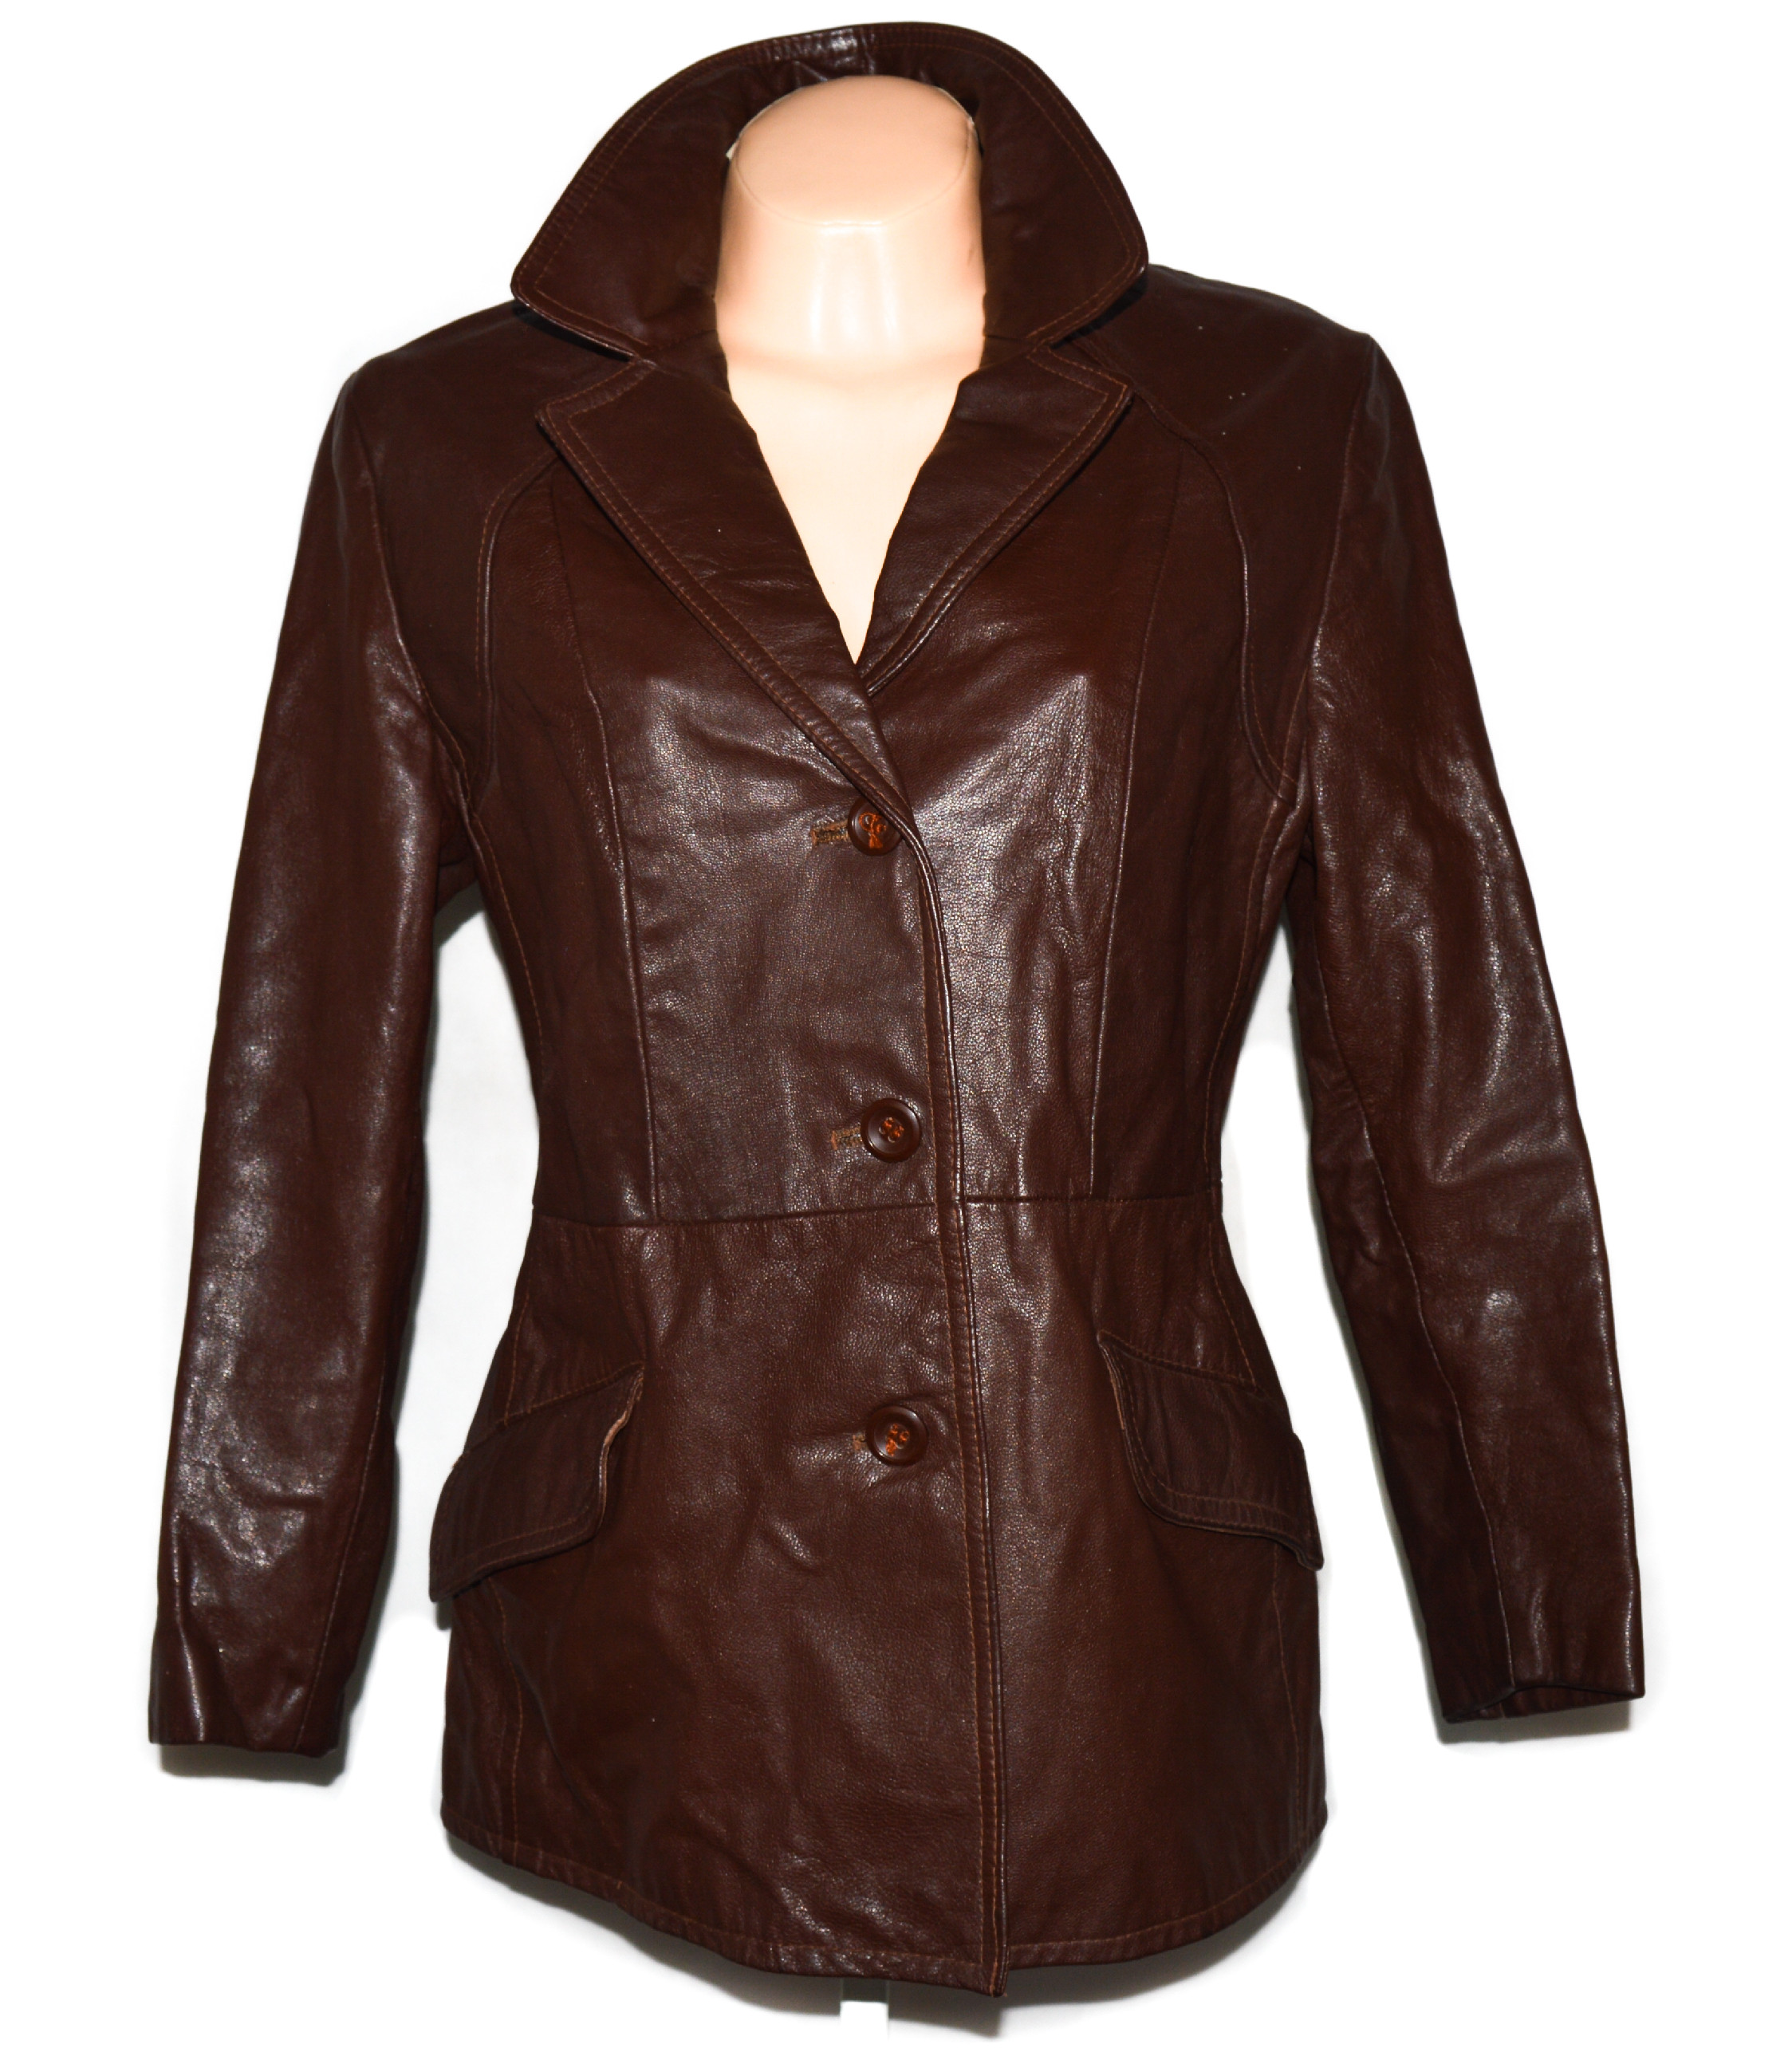 KOŽENÝ dámský hnědý kabátek - sako GALA L